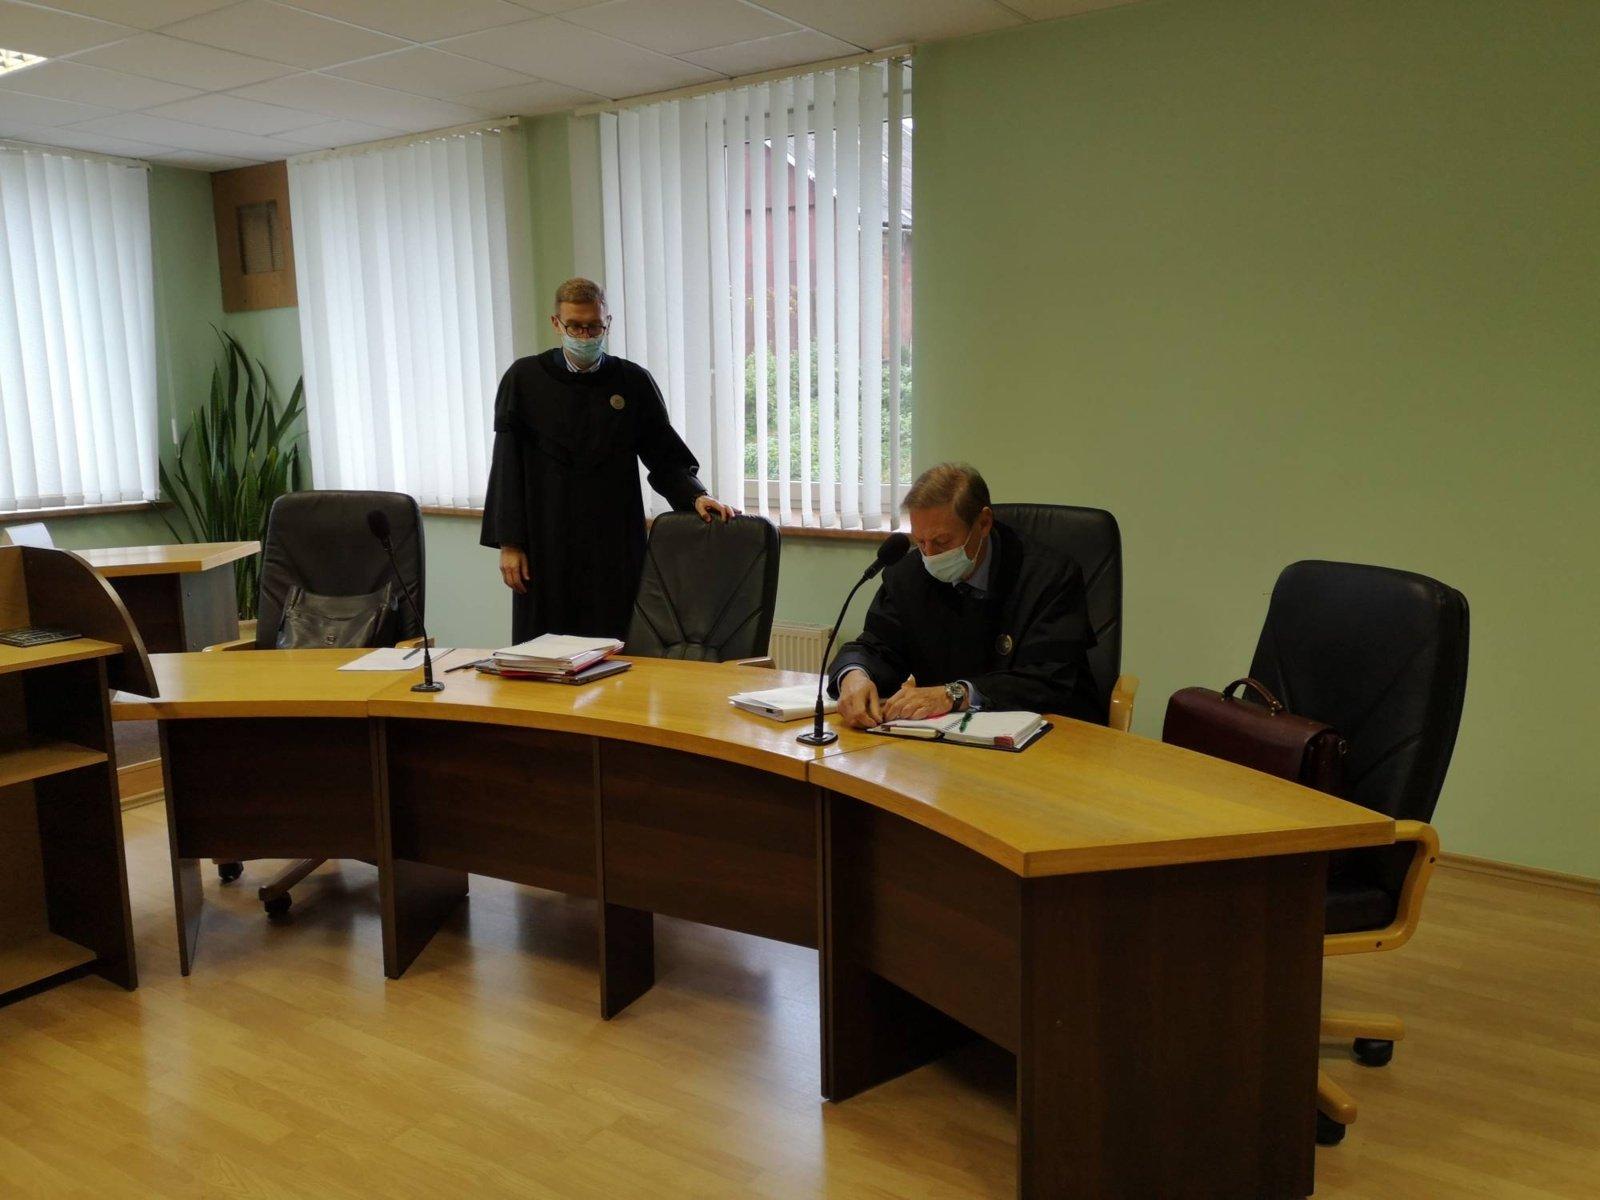 Prokurorė prieštarauja STT įrašų ekspertizei